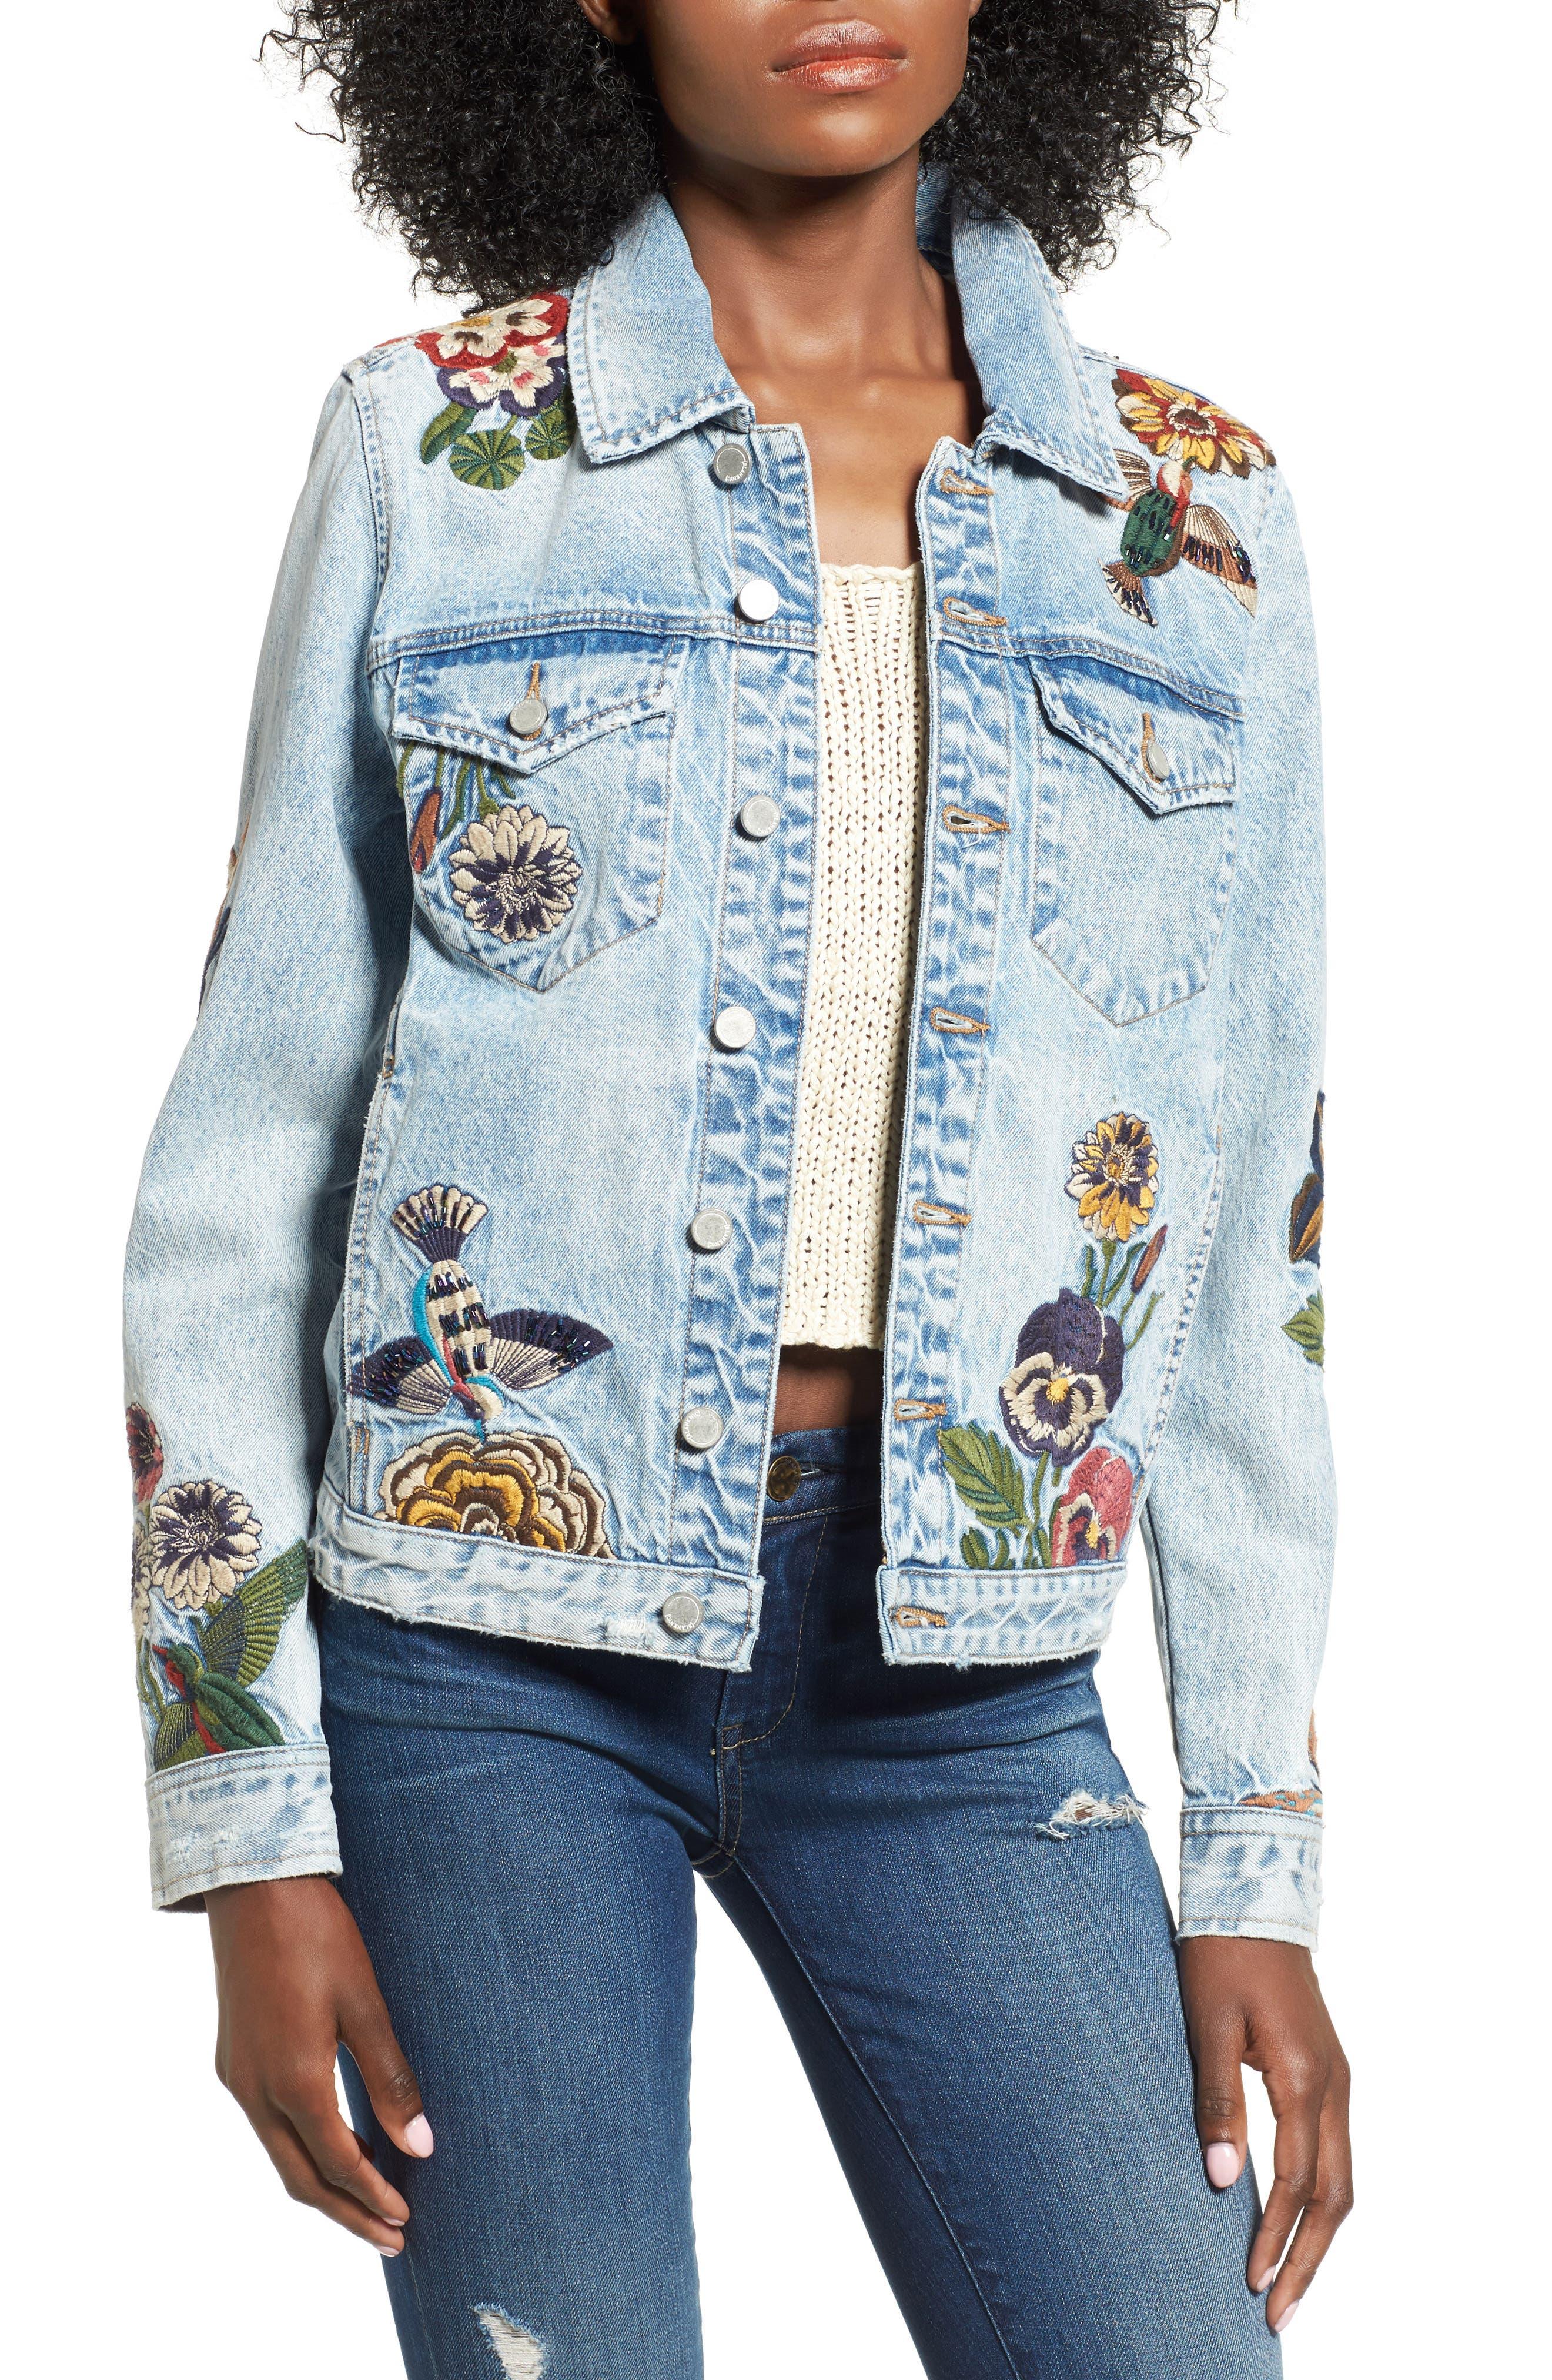 Alternate Image 1 Selected - BLANKNYC Embroidered Denim Jacket